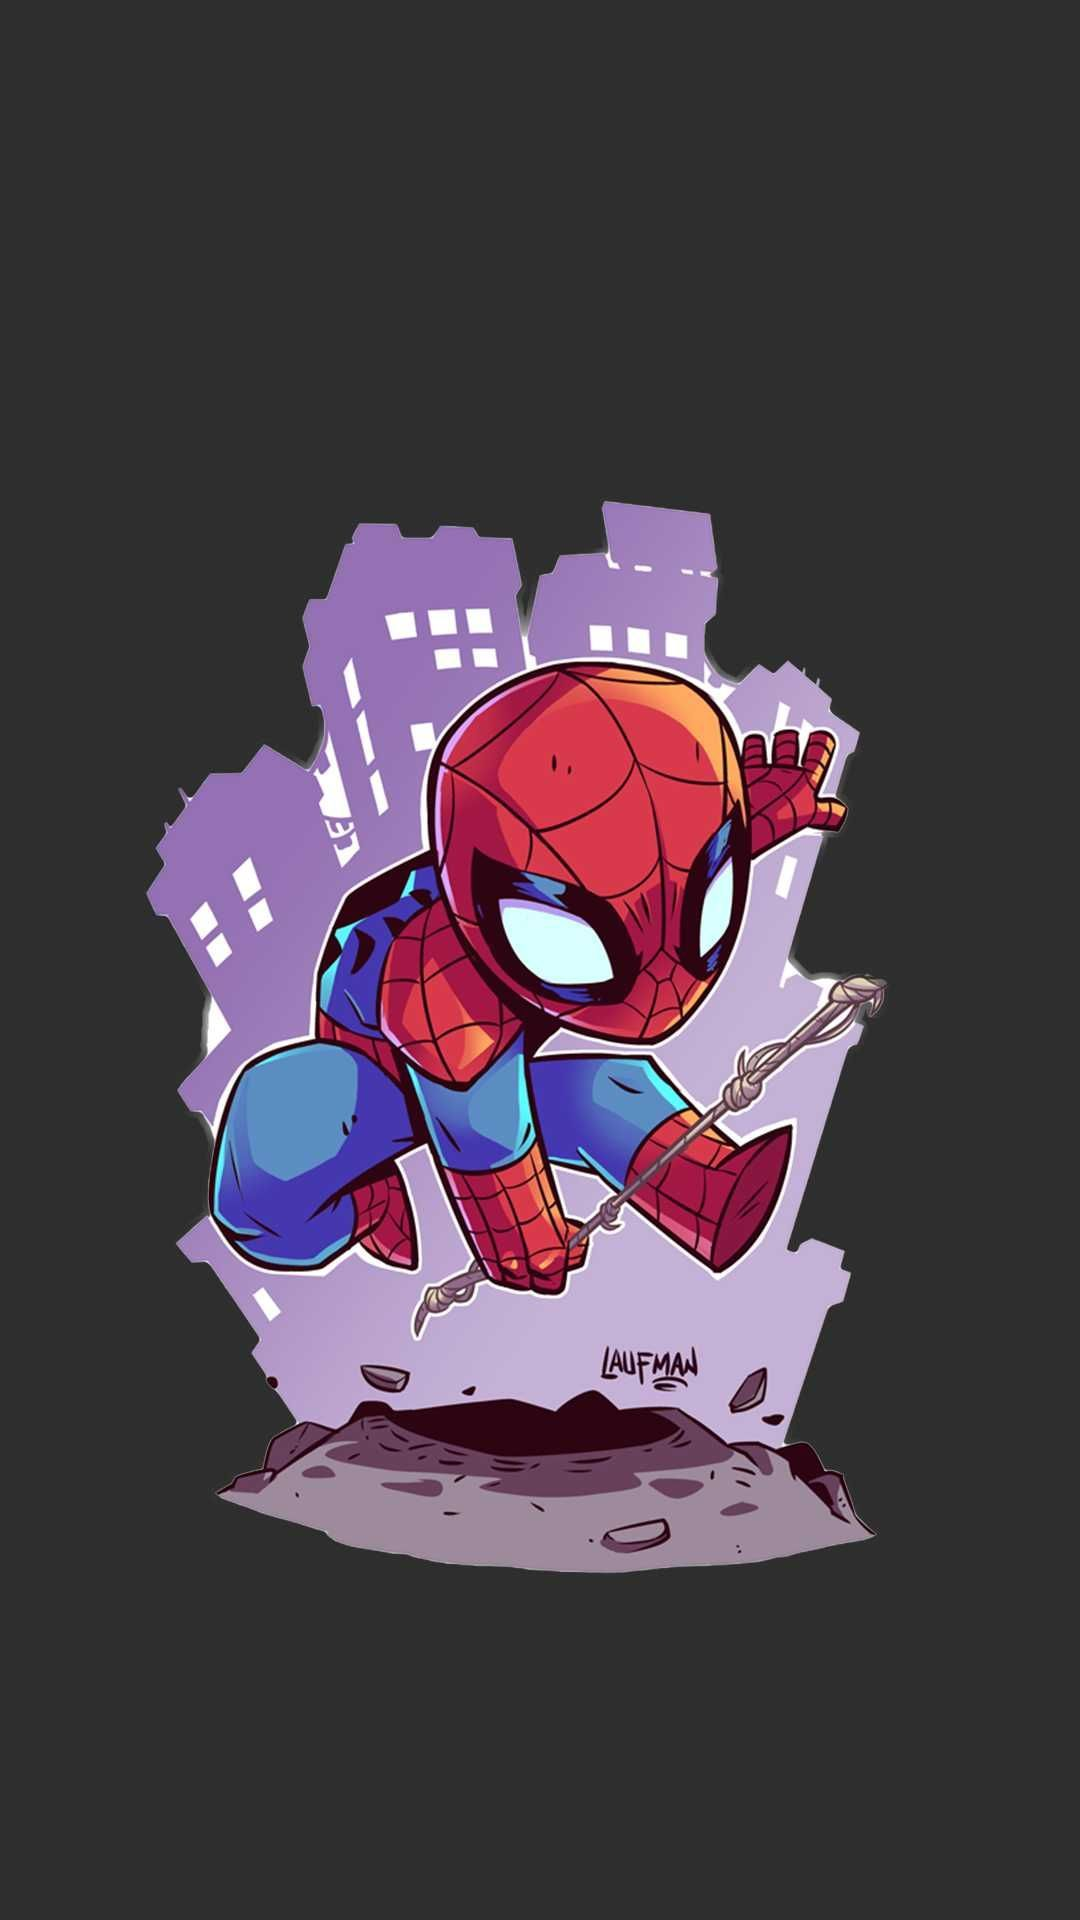 Spiderman Animated Art Iphone Wallpaper In 2020 Superhero